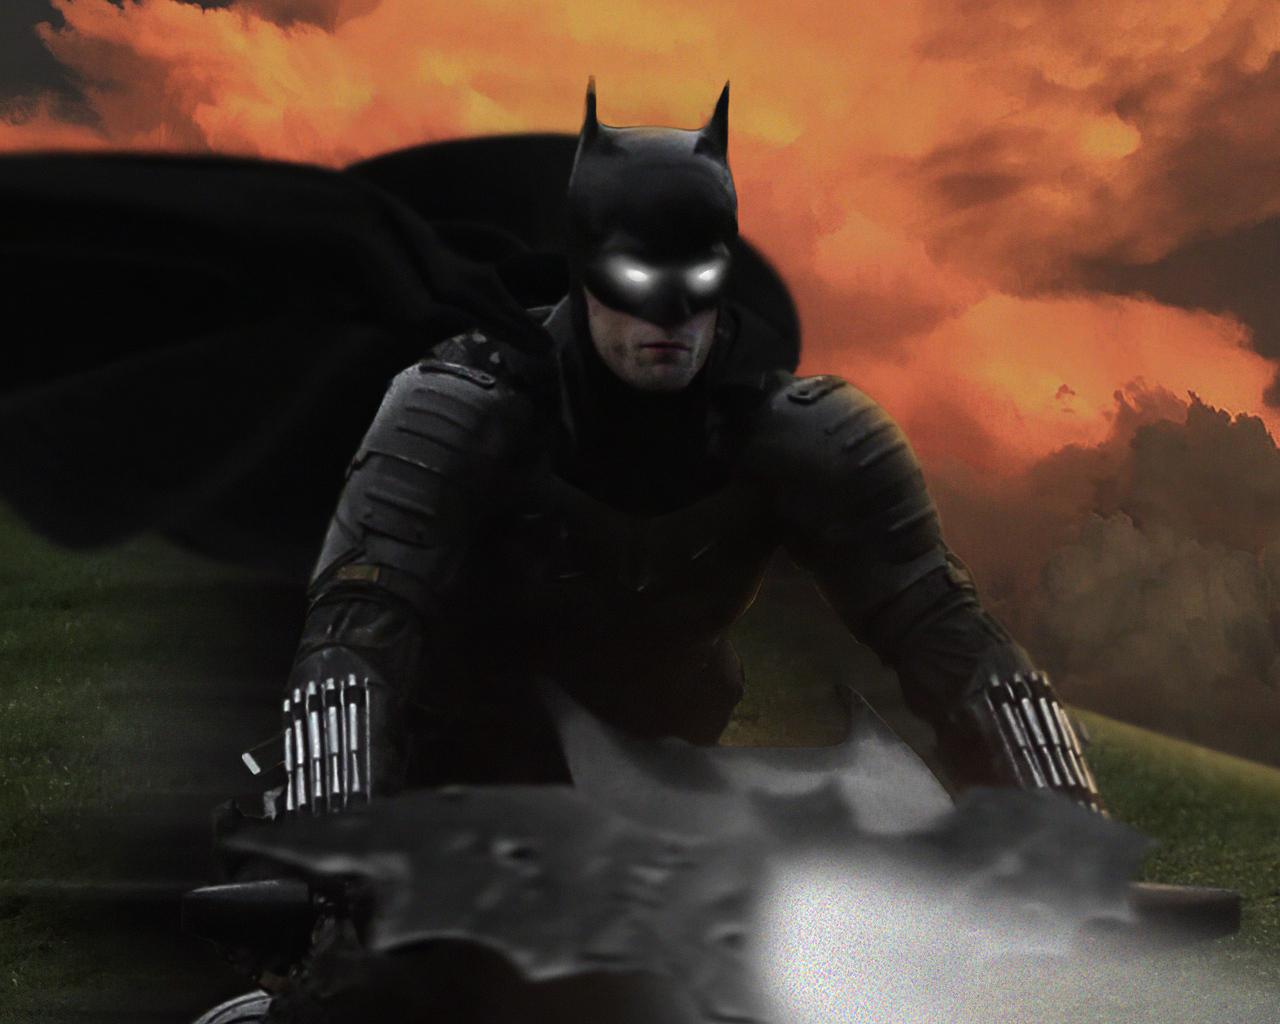 batman-on-batcycle-4k-z1.jpg